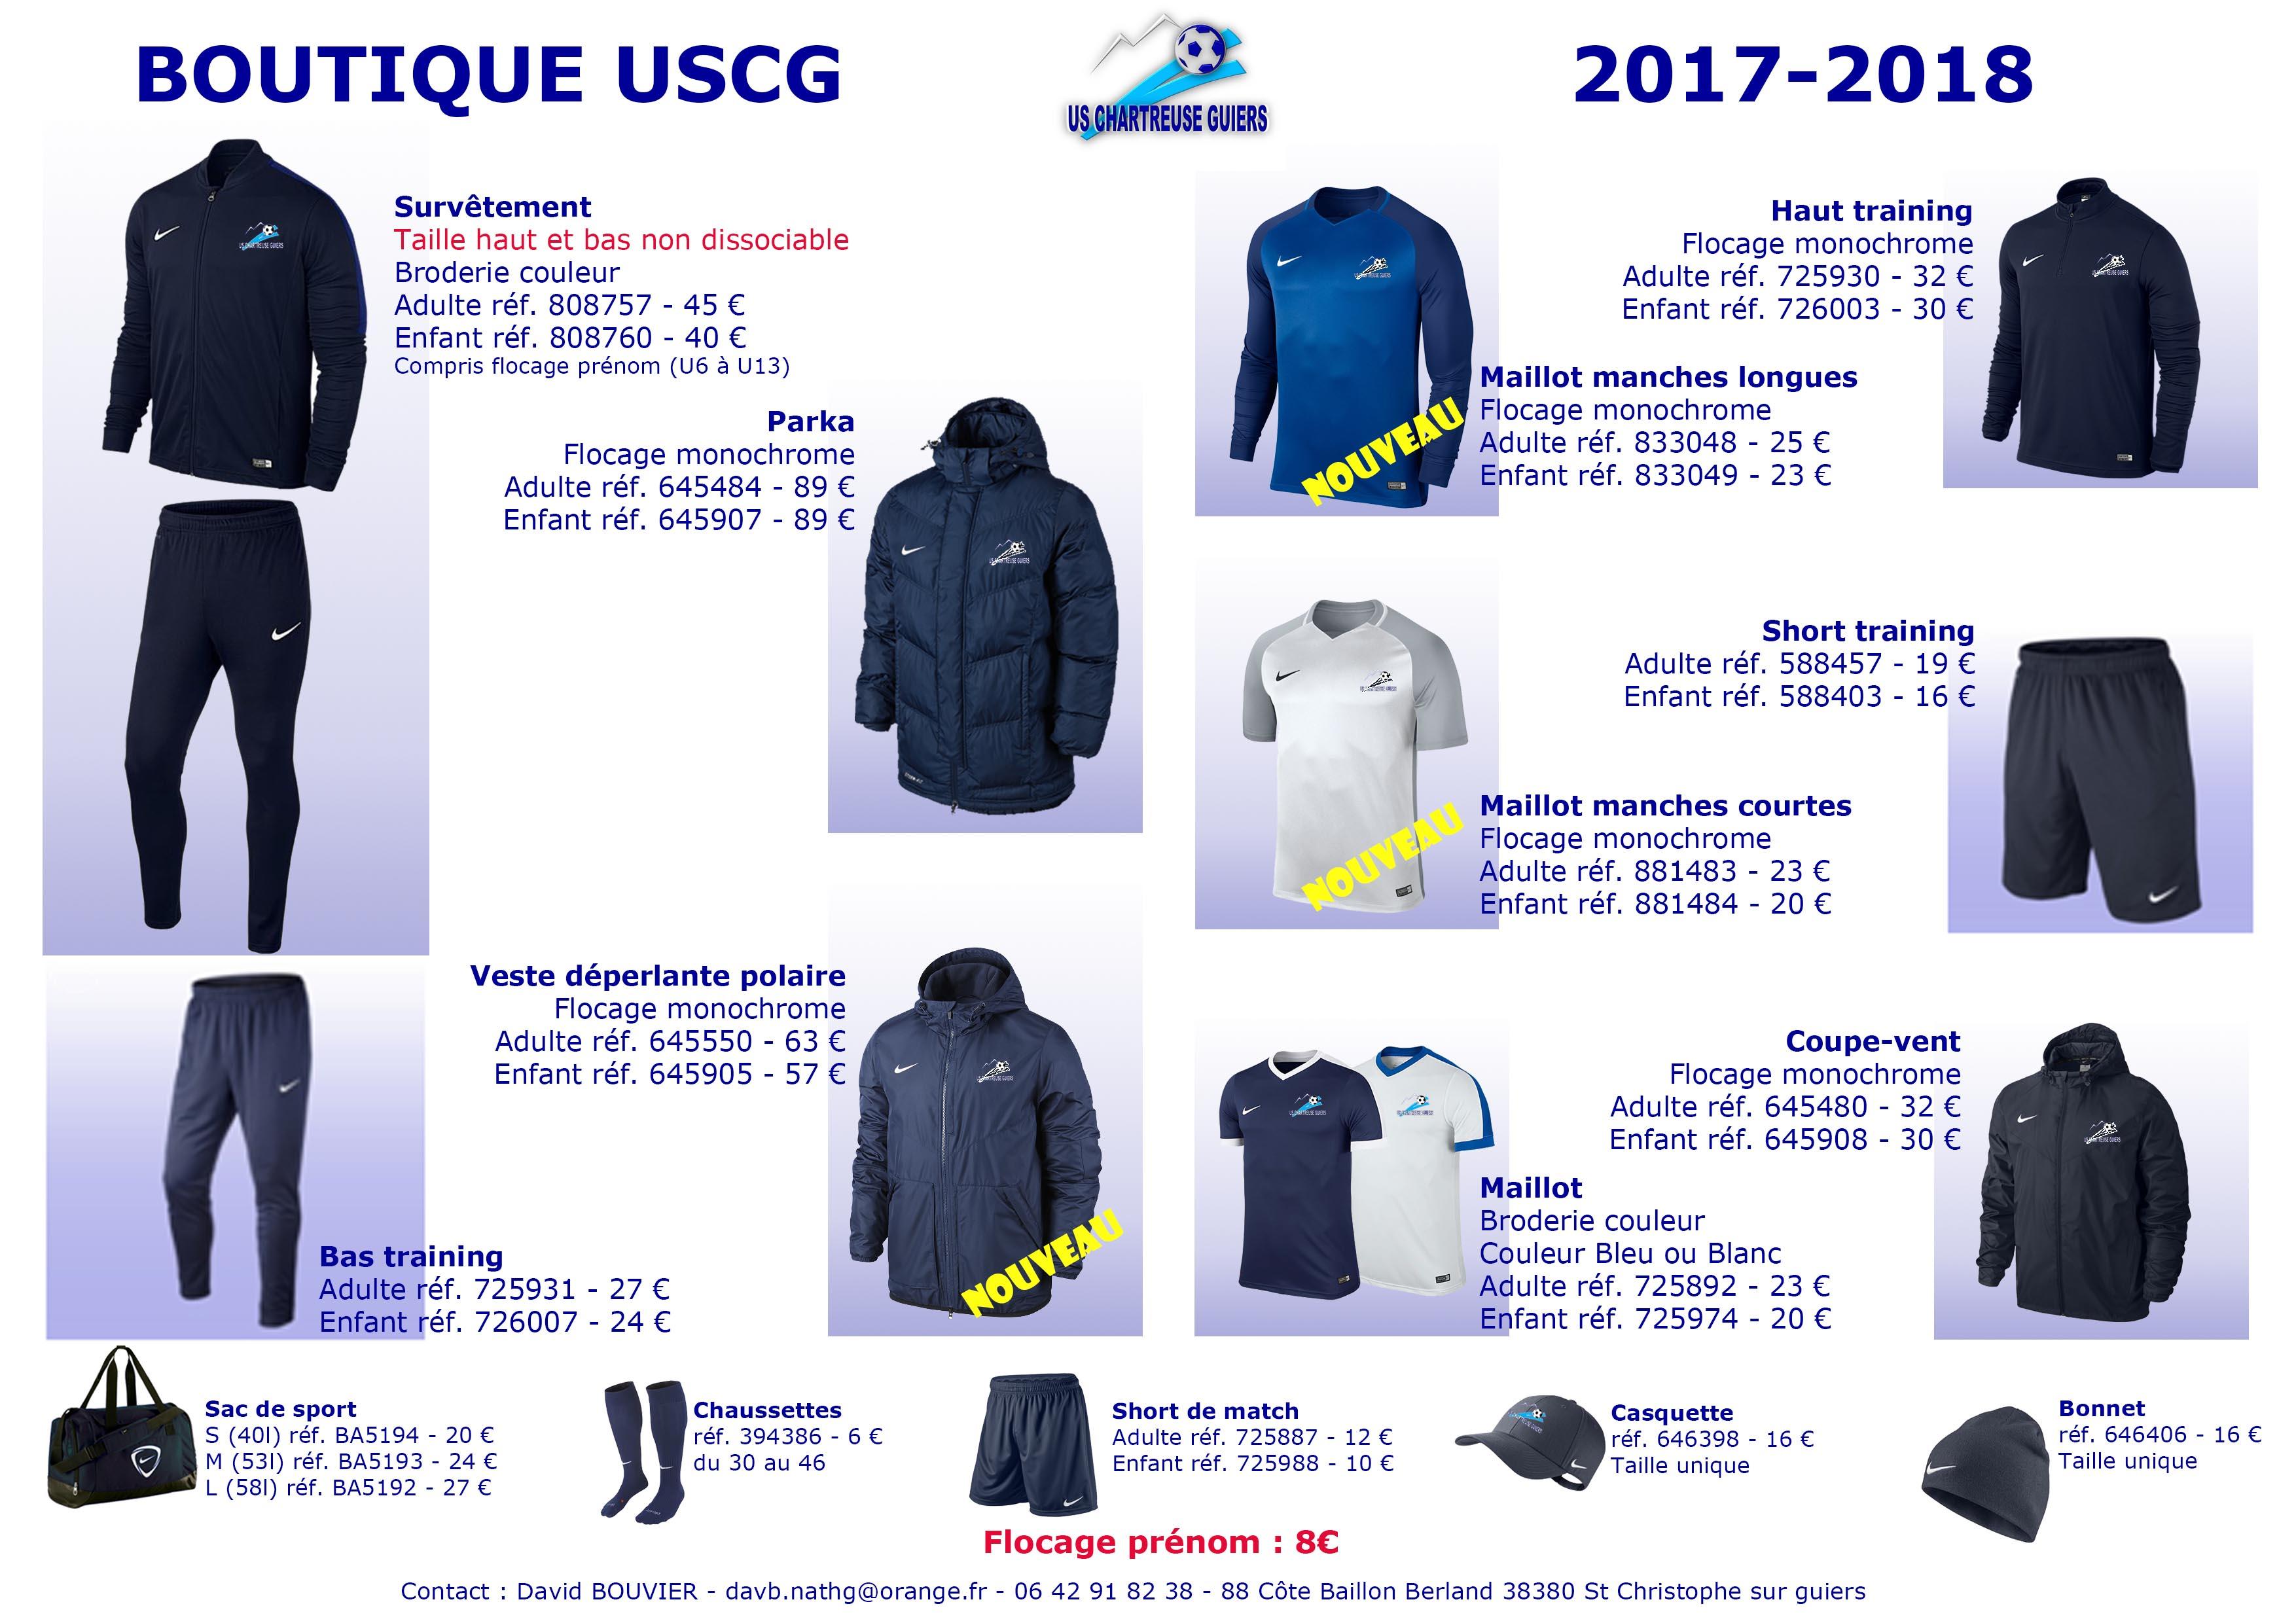 Boutique 2017 2018 light.jpg